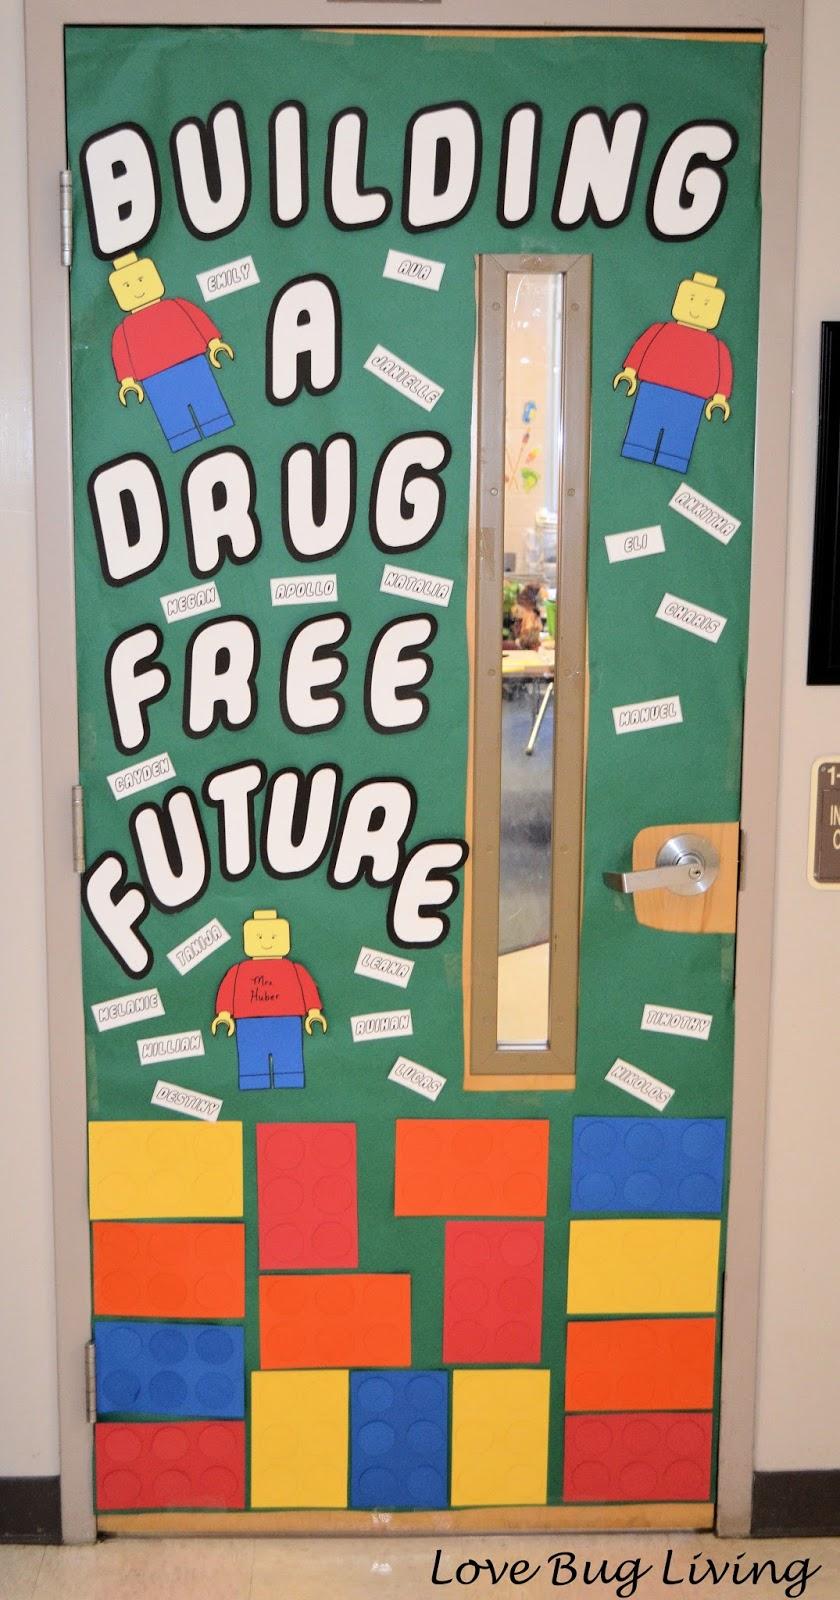 Love Bug Living: Red Ribbon Week Lego Door Decorations